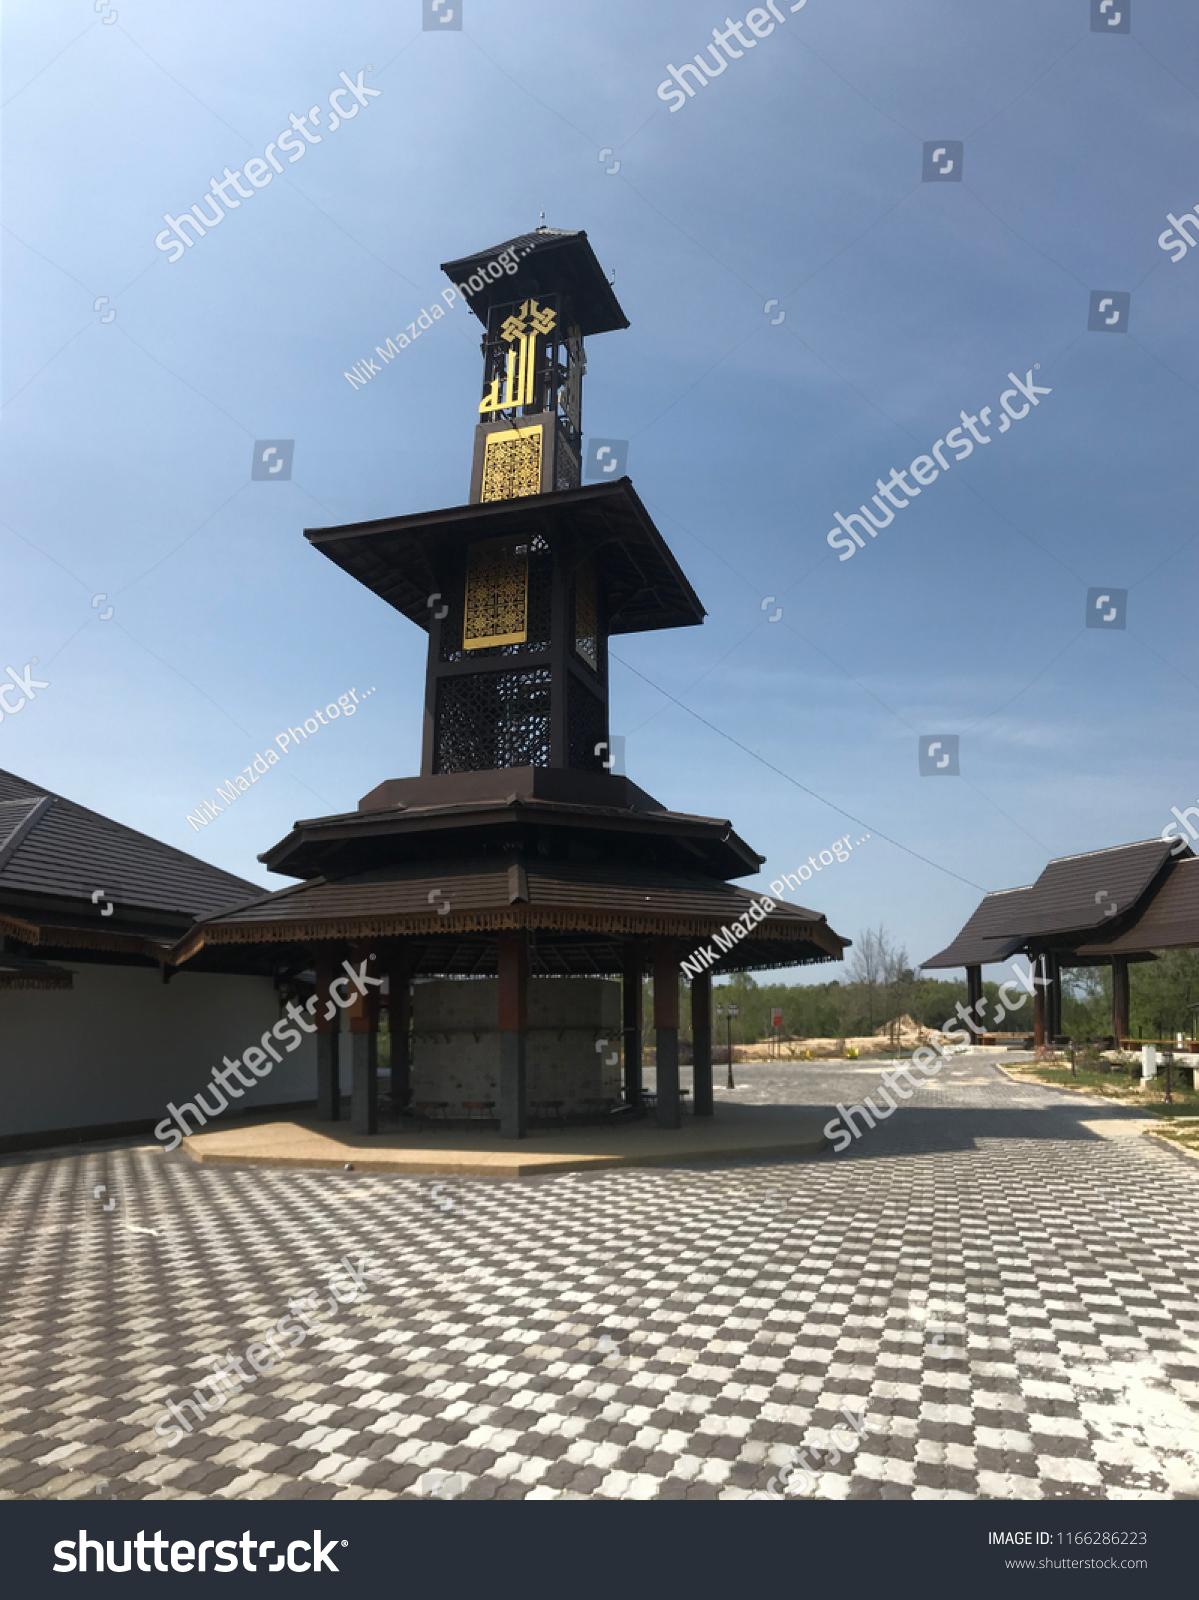 Masjid Arrahman Pulau Gajah Kelantan This Buildings Landmarks Stock Image 1166286223